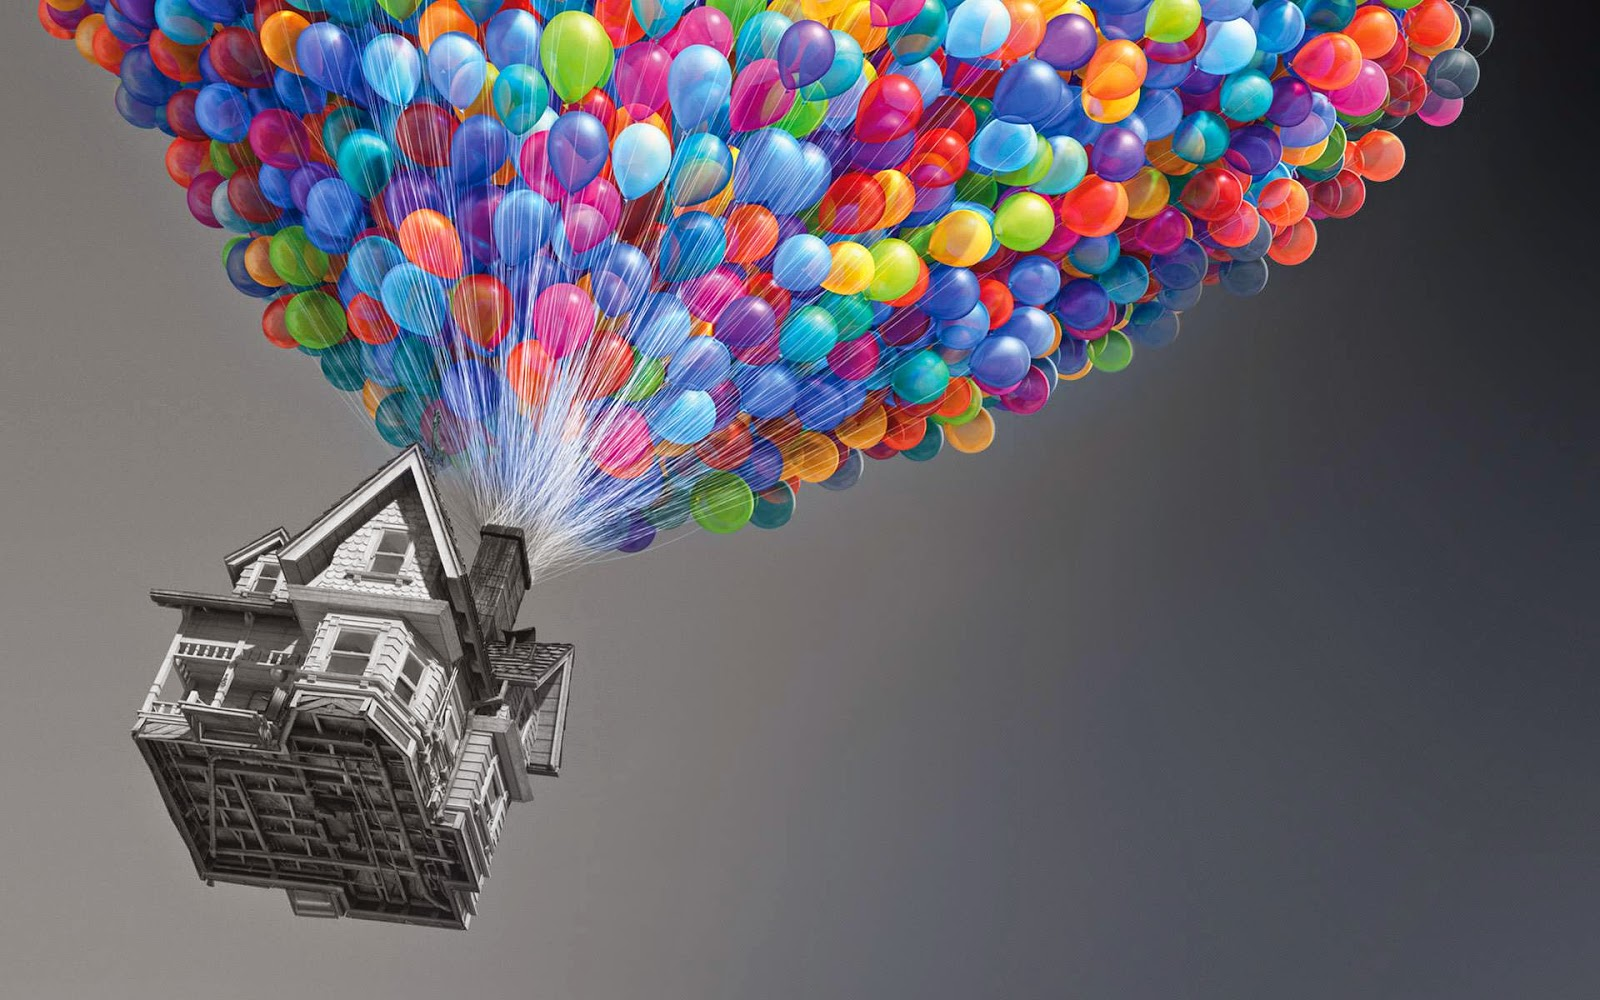 Balon Wallpaper Bayam Wallpaper Blog